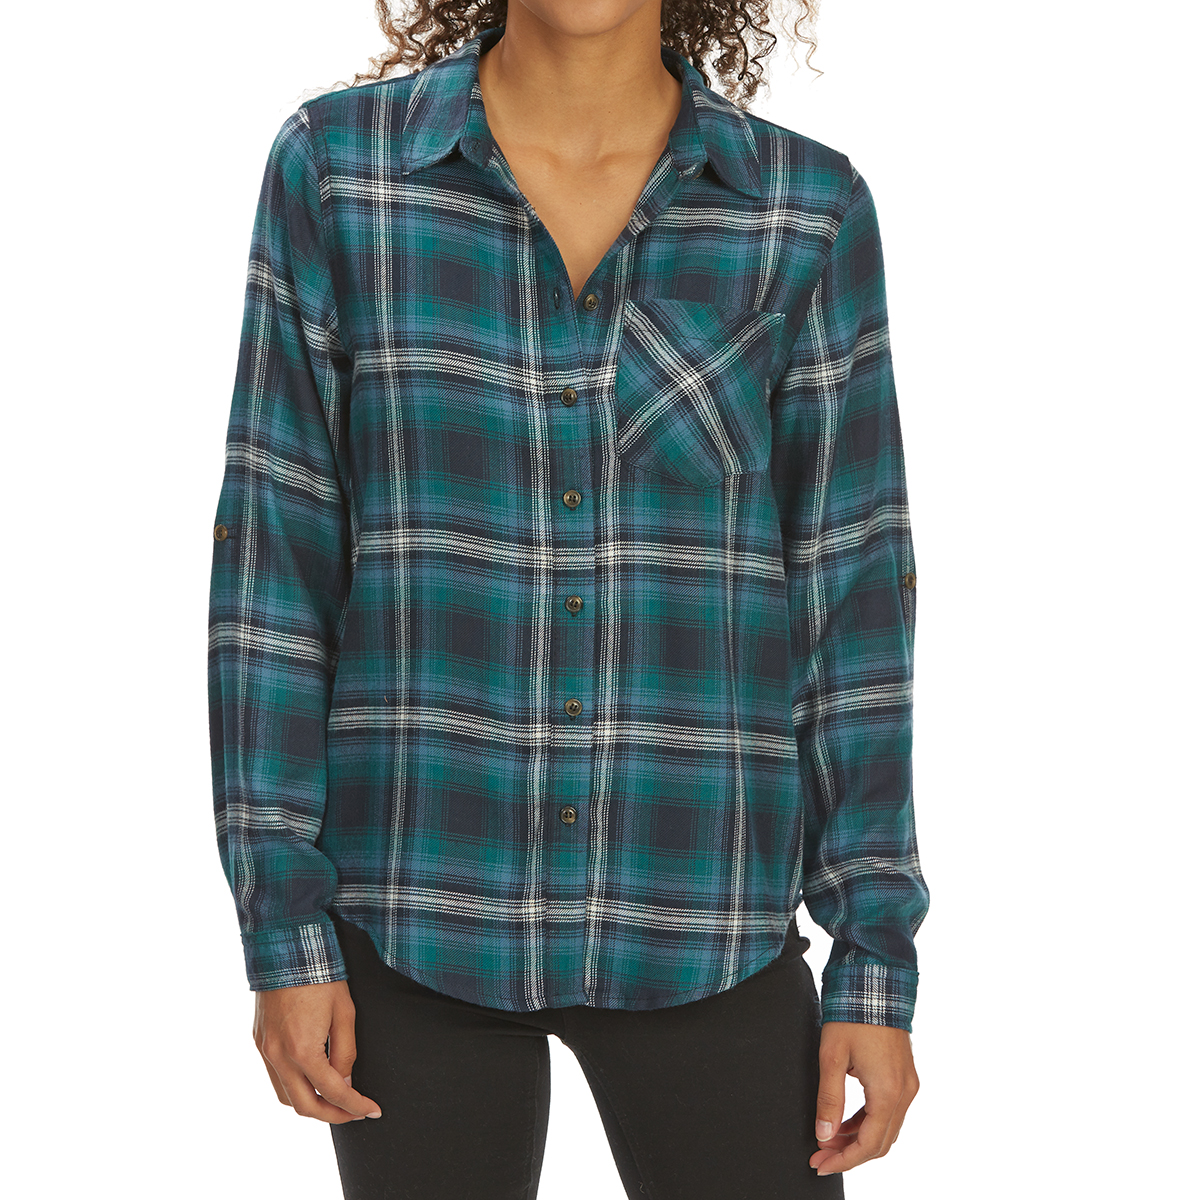 Pink Rose Juniors' Brushed Windowpane Plaid Long-Sleeve Flannel Shirt - Green, M